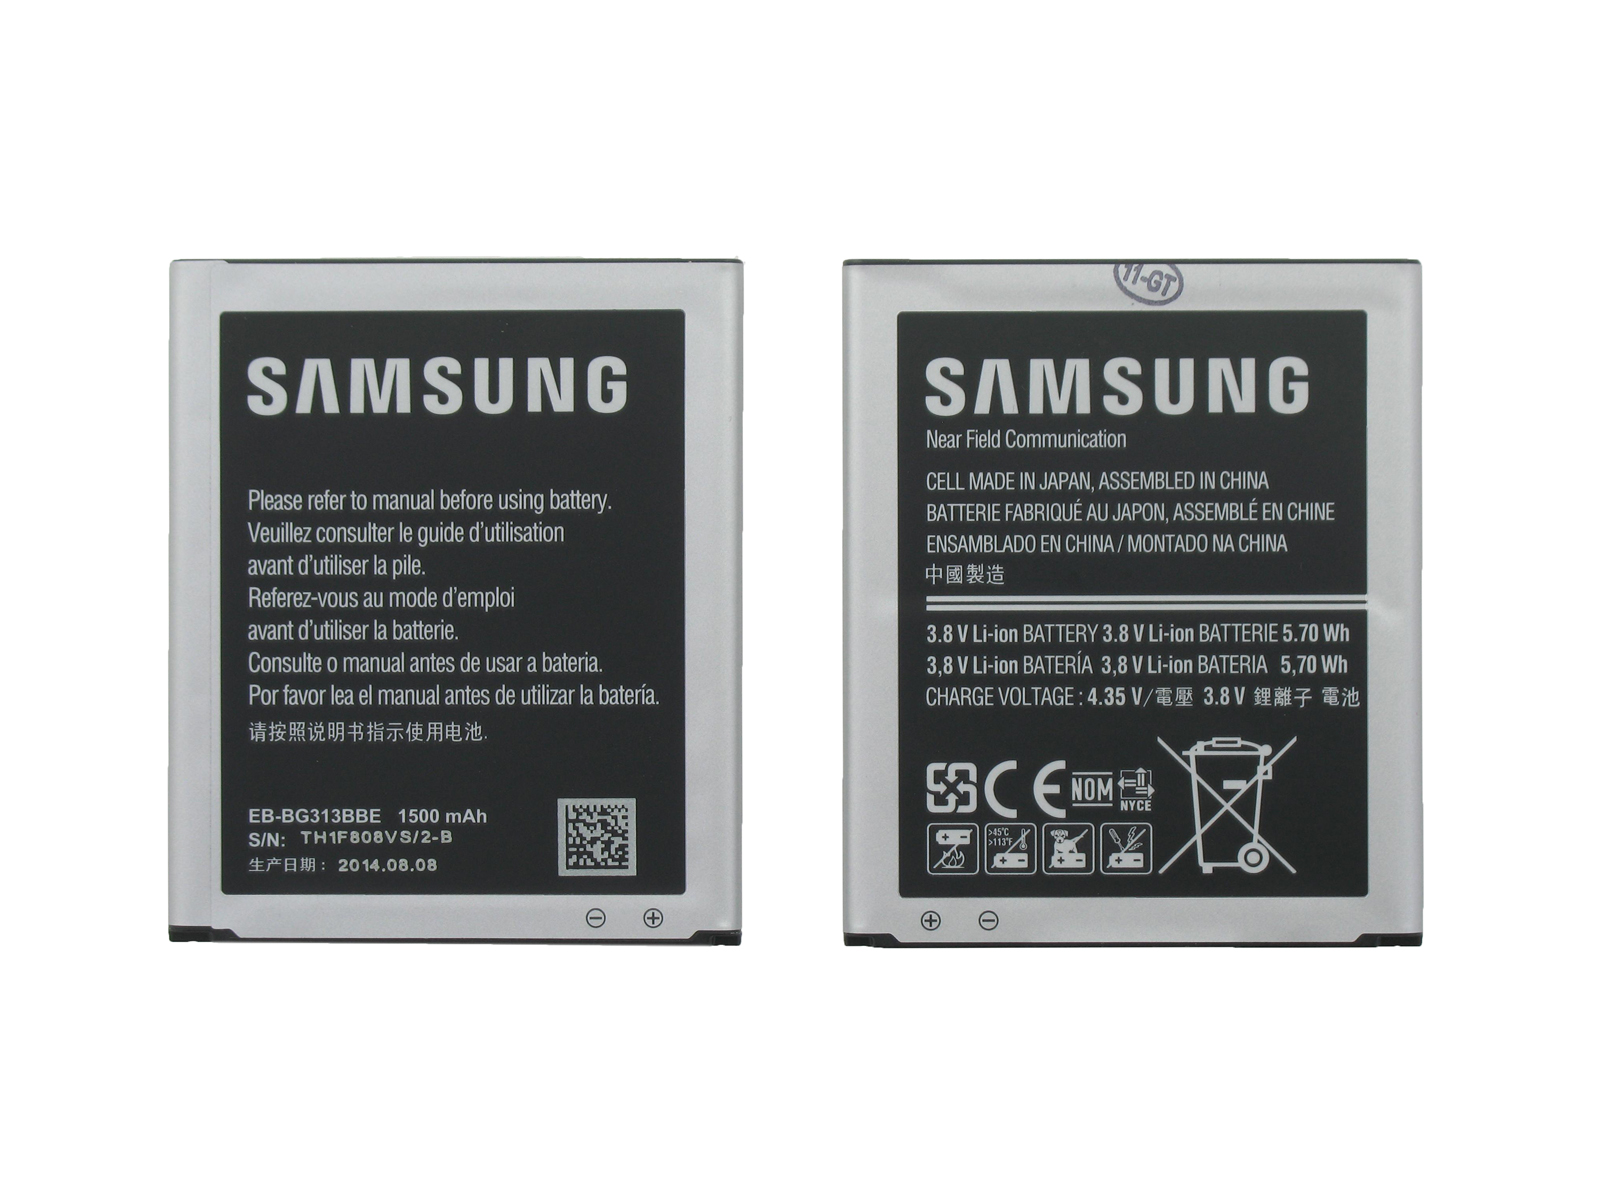 Samsung Baterai Galaxy V Sm G313hz Ace Iii 1500 Mah 3 8v Original Hippo G313 2000mah Batre Batrai Hp Source Description